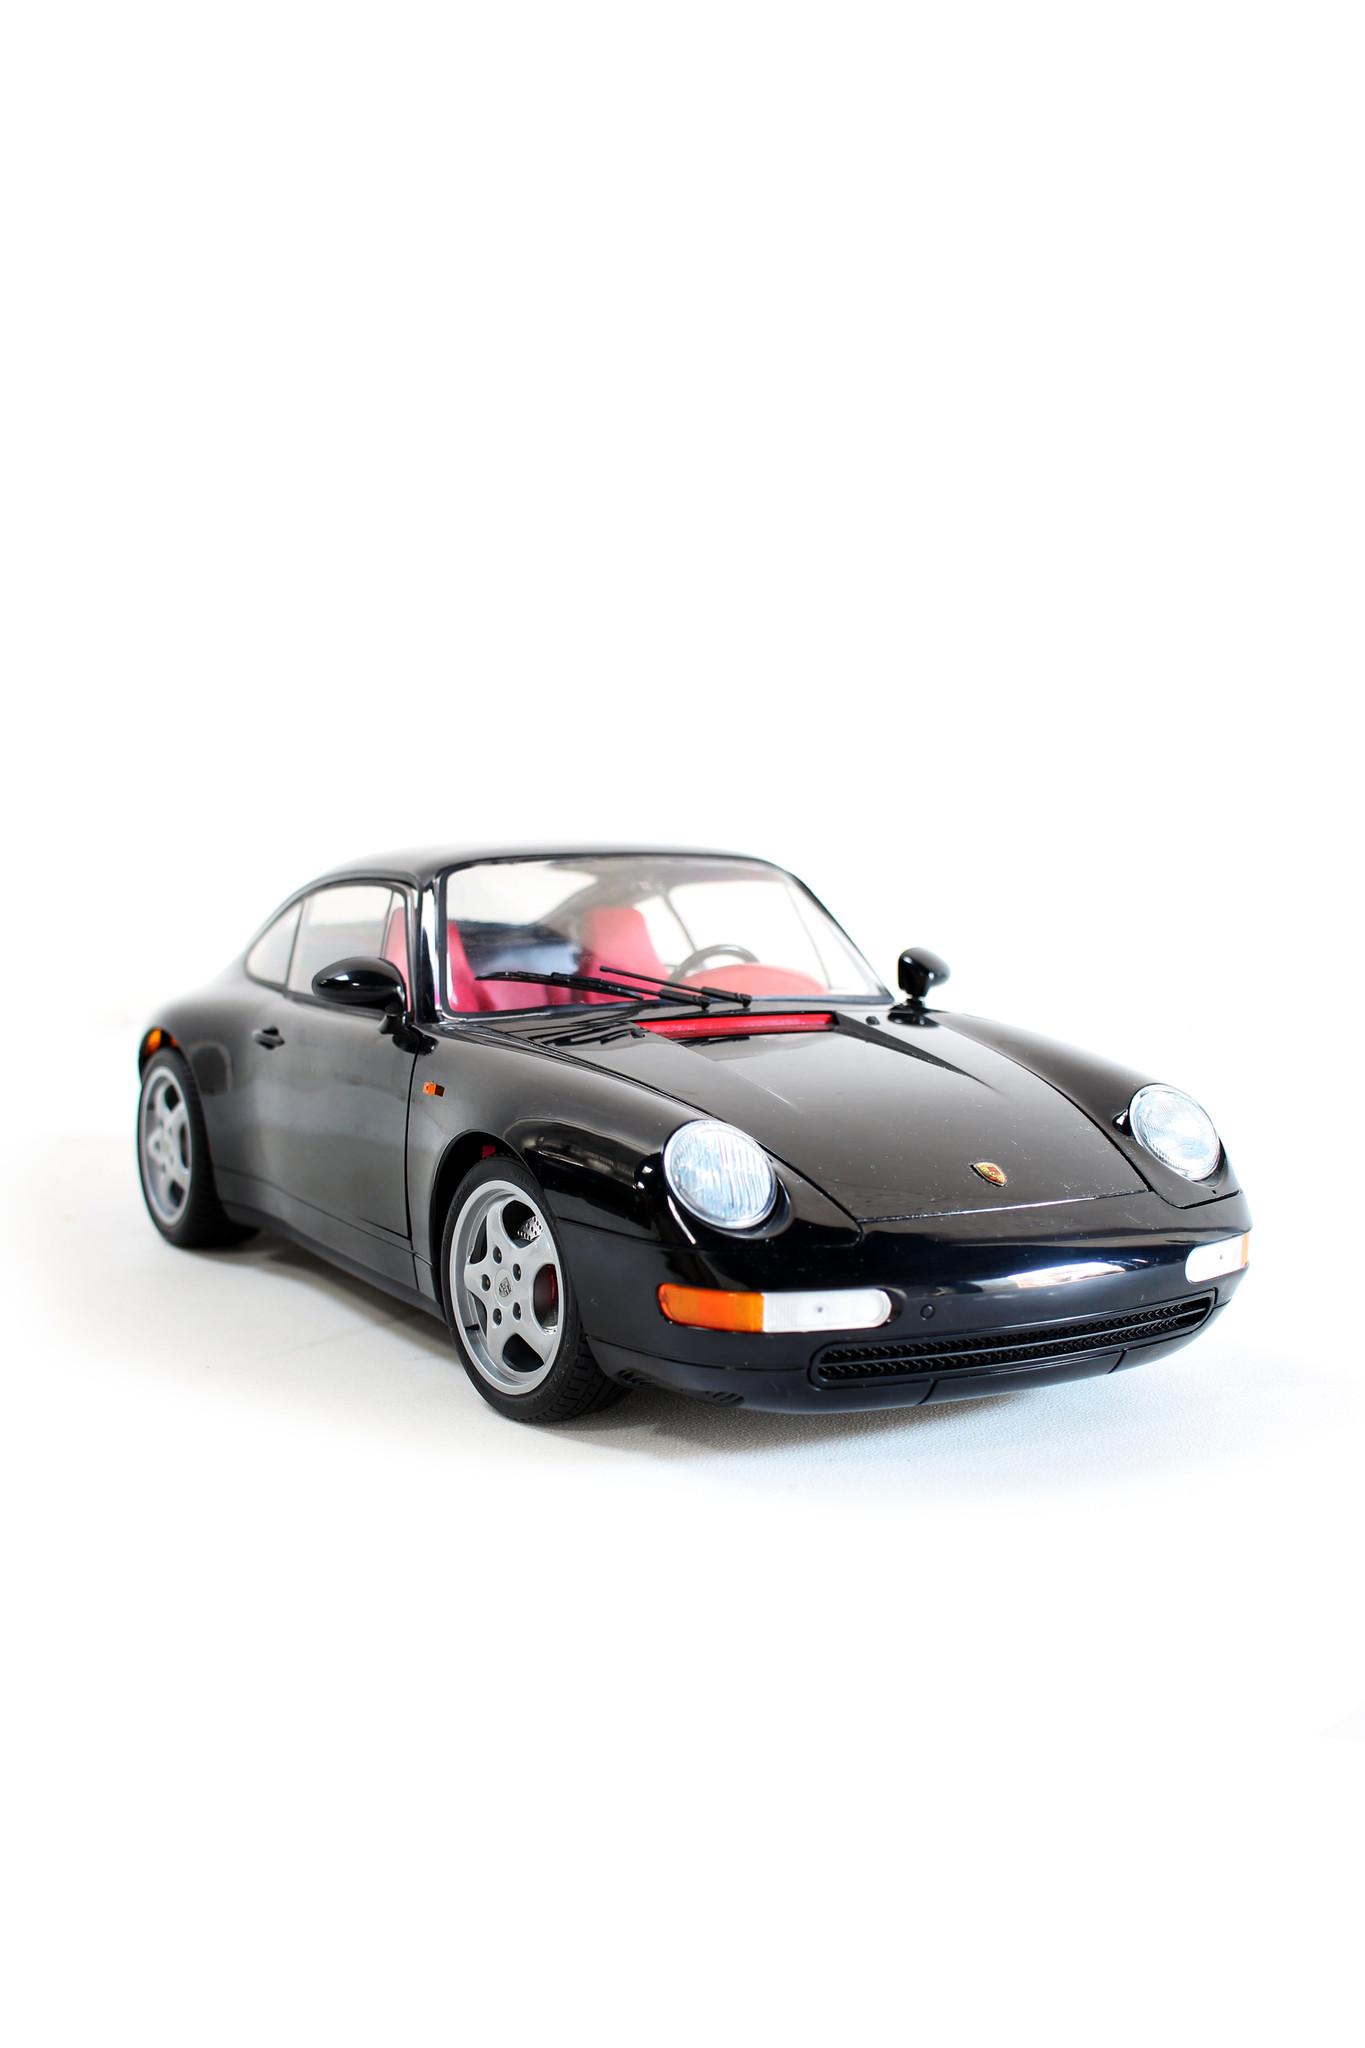 Scale model 1: 8 Porsche 993 Pocher